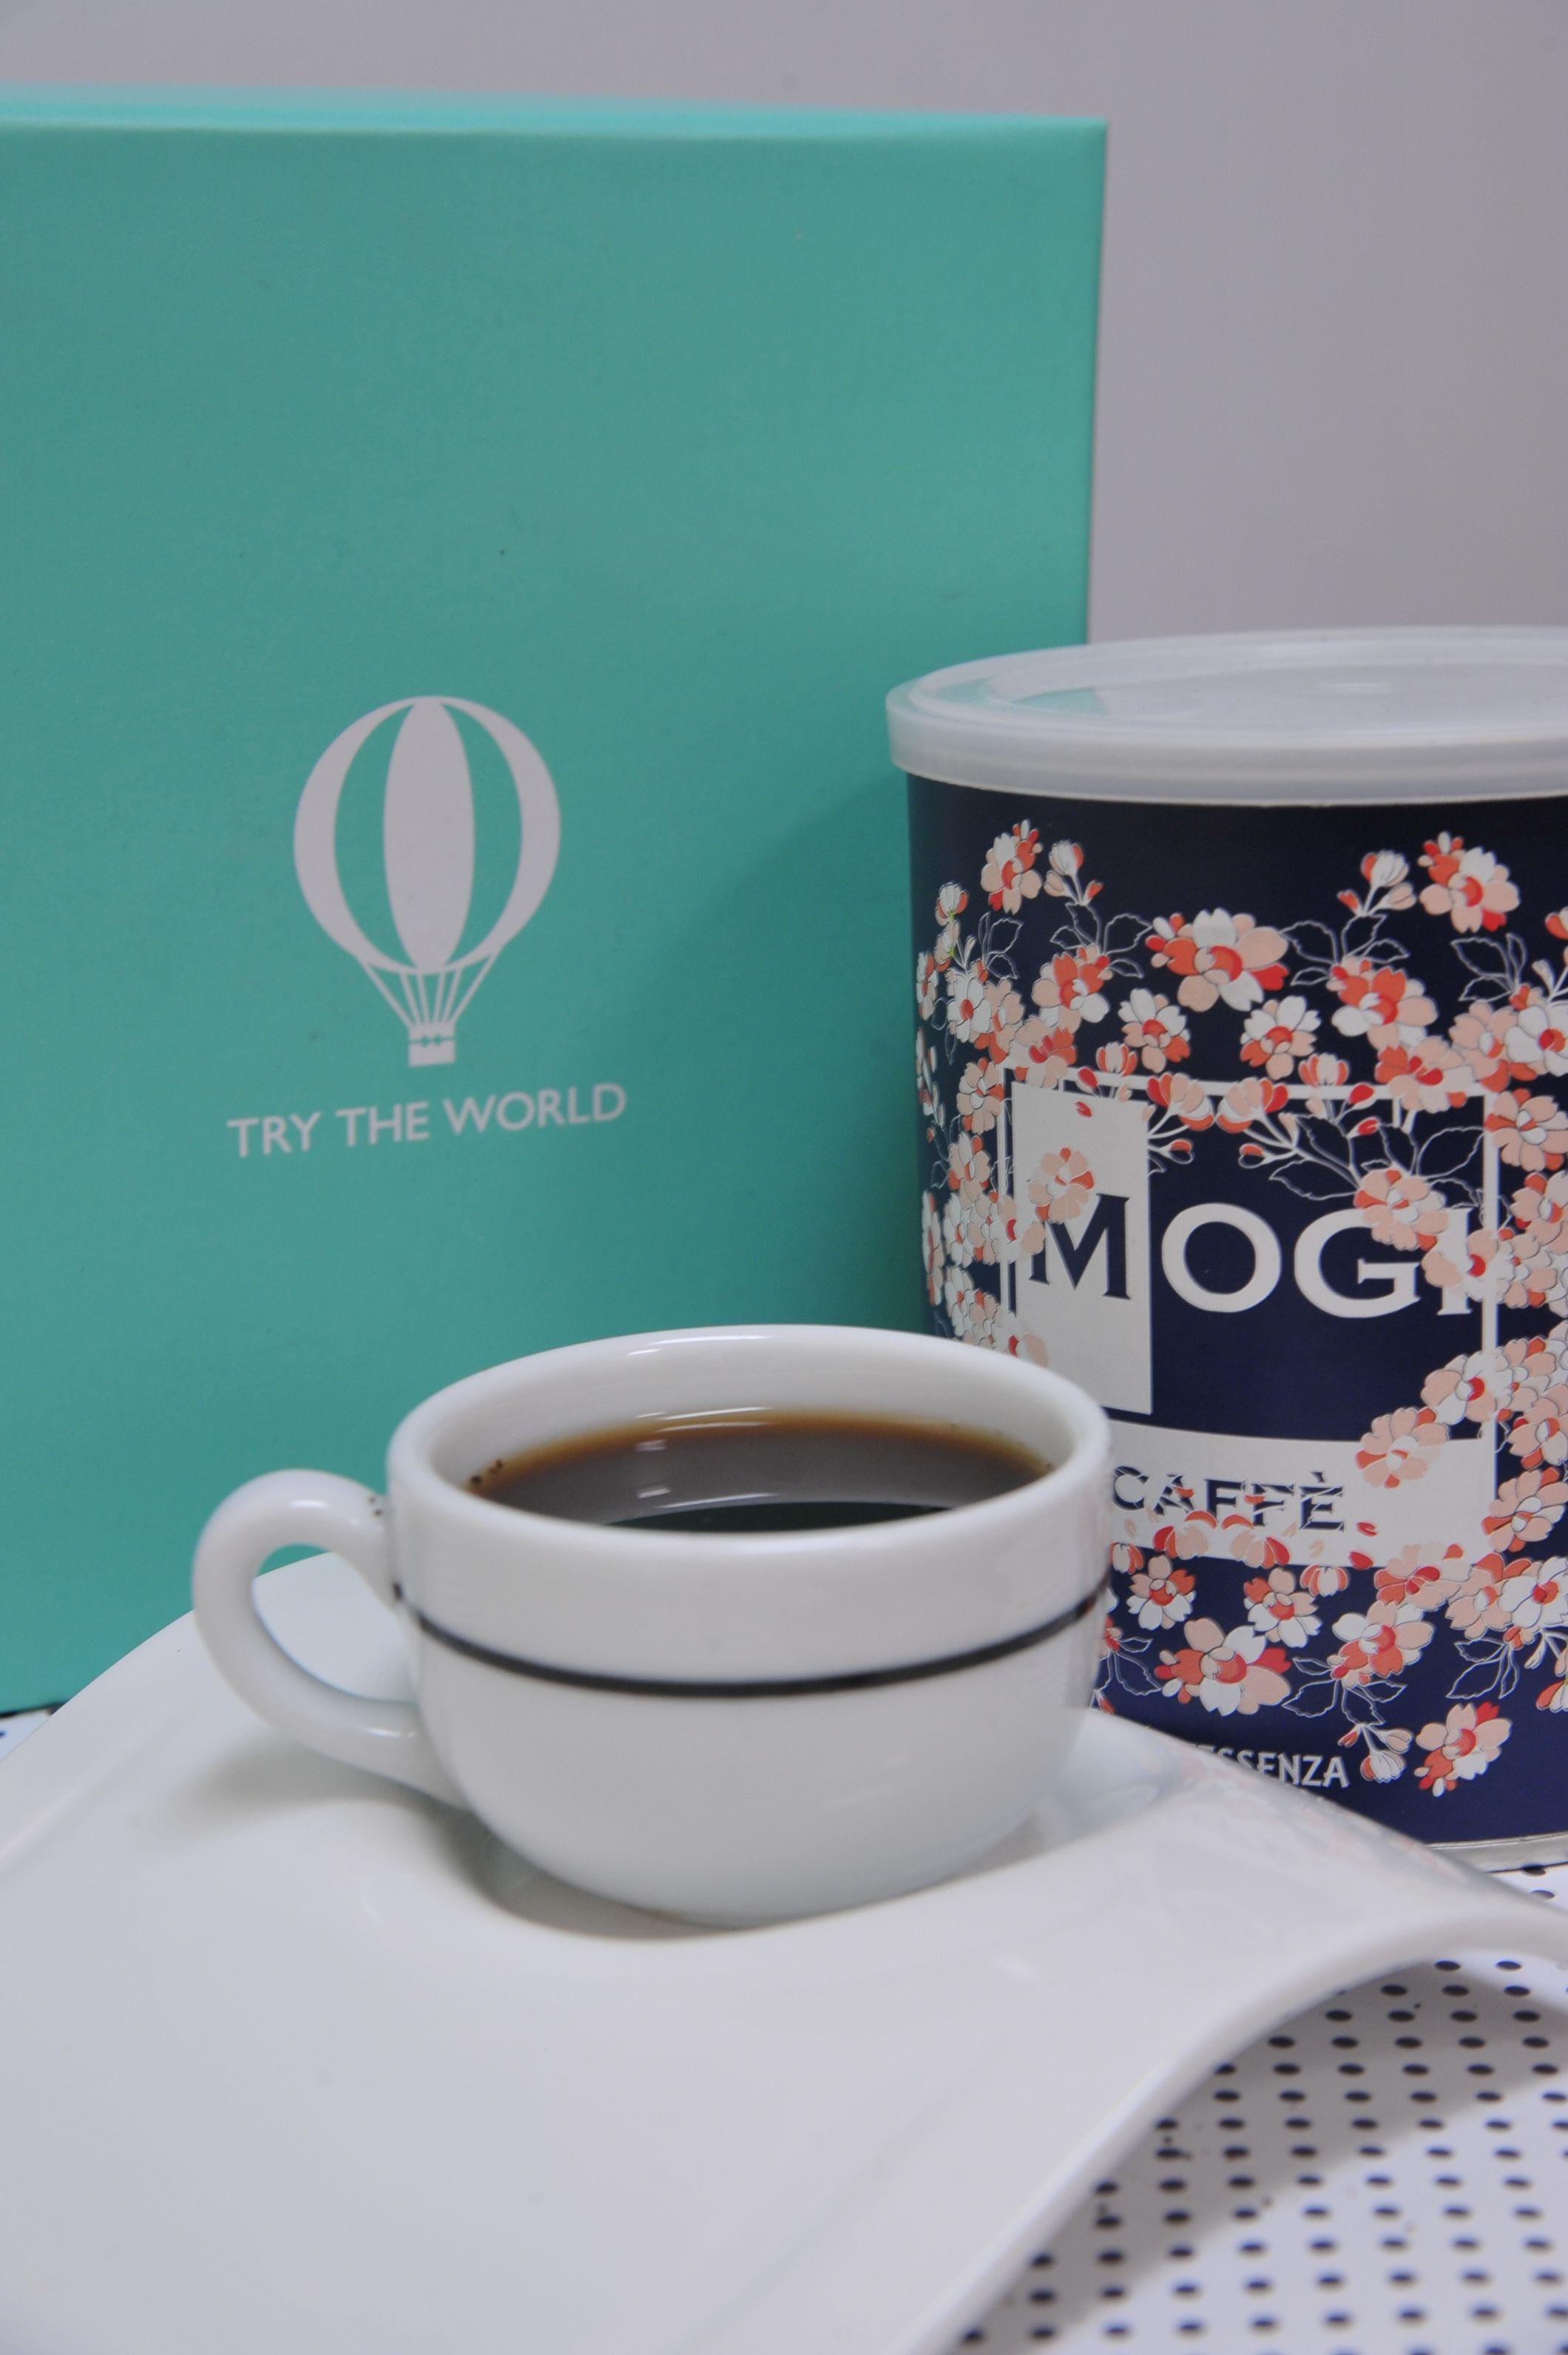 Enjoy a cup of Mogi Caffé coffee found in our Venice box